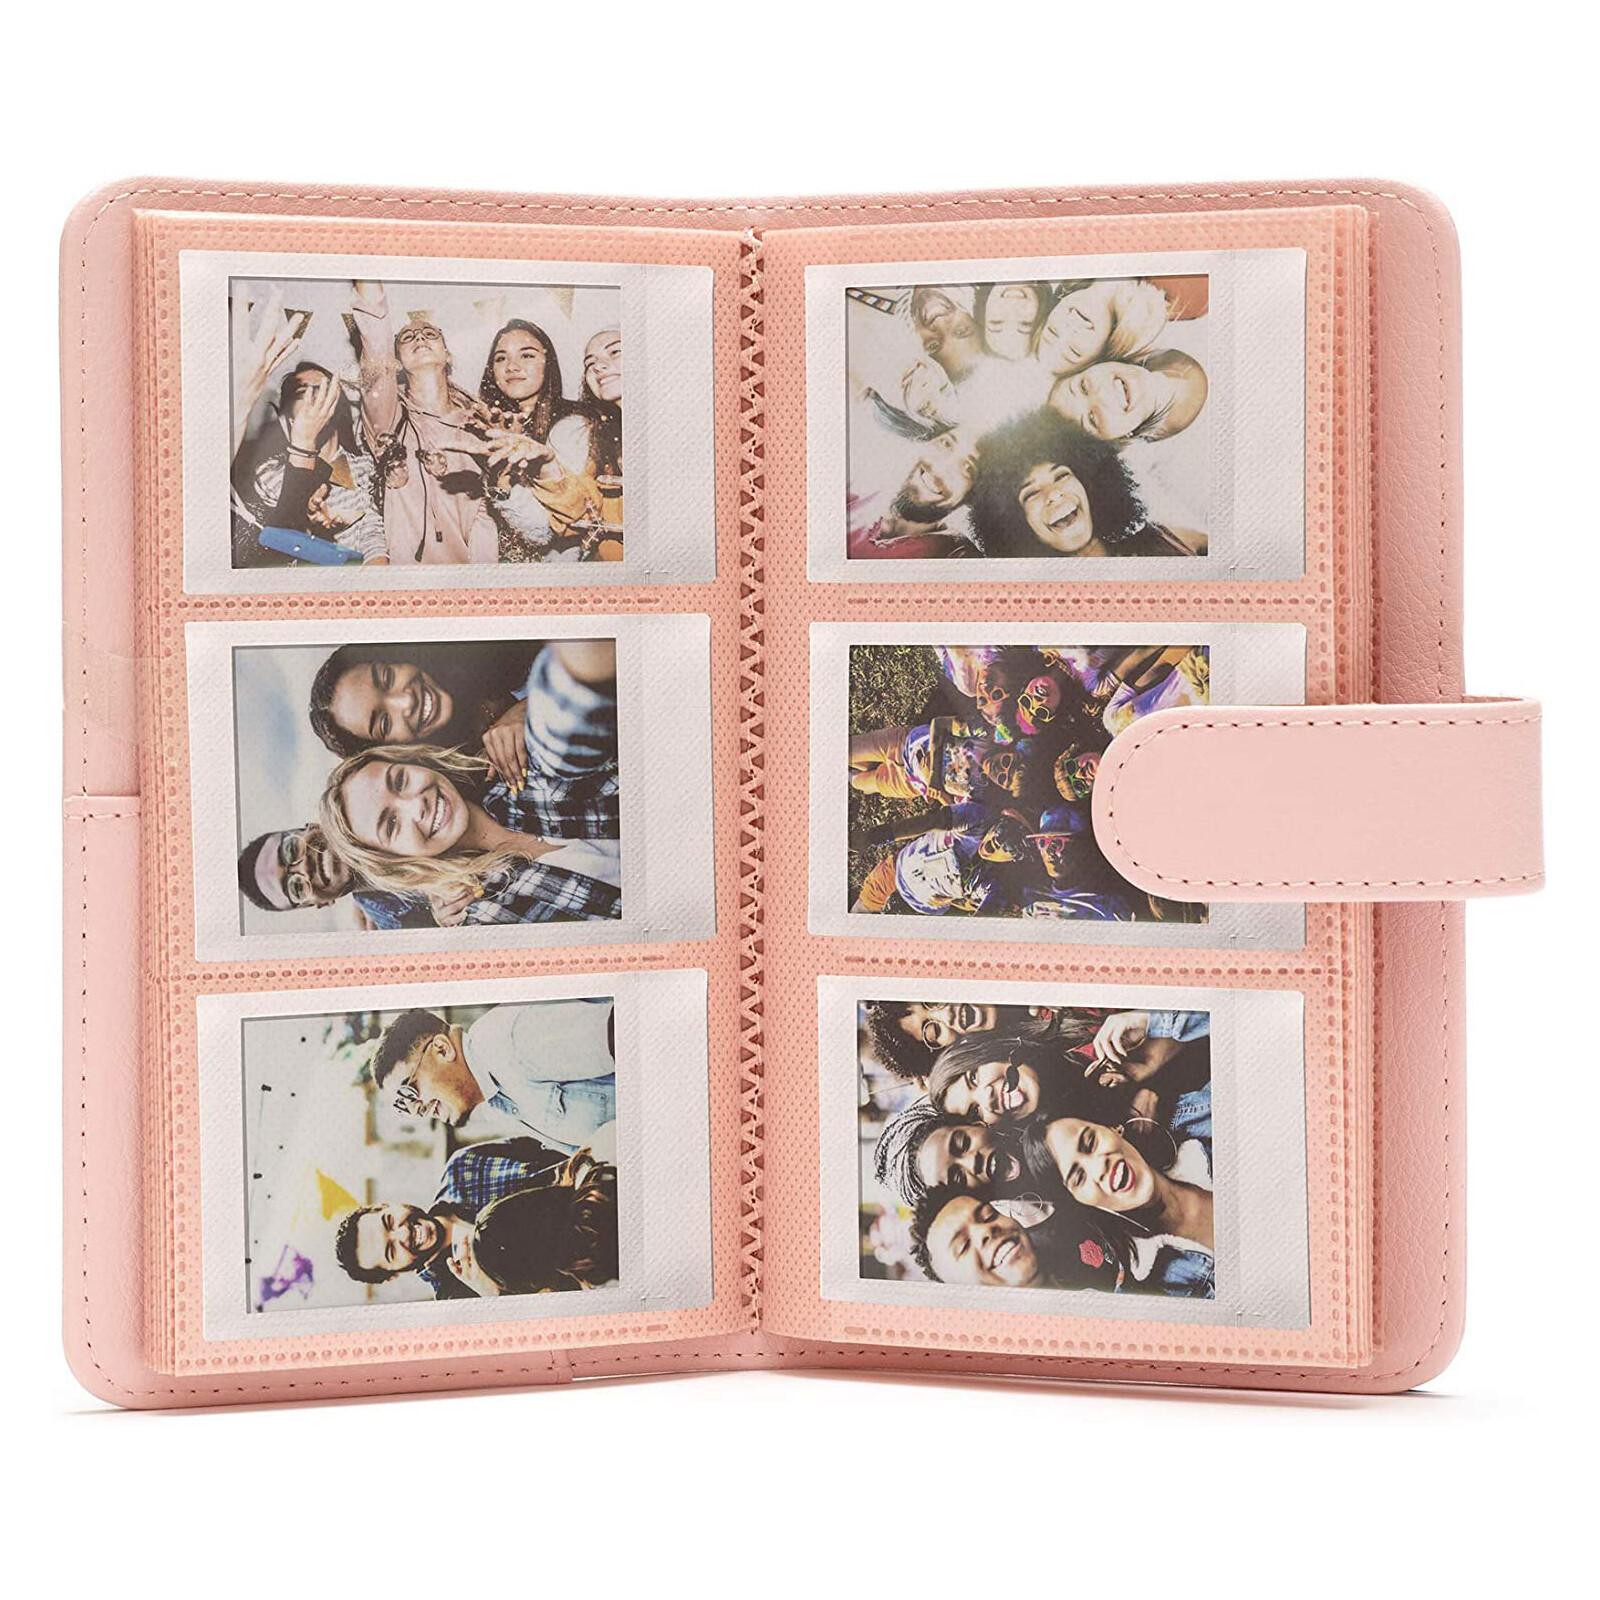 Fujifilm Instax Mini 11 Album Blush Pink